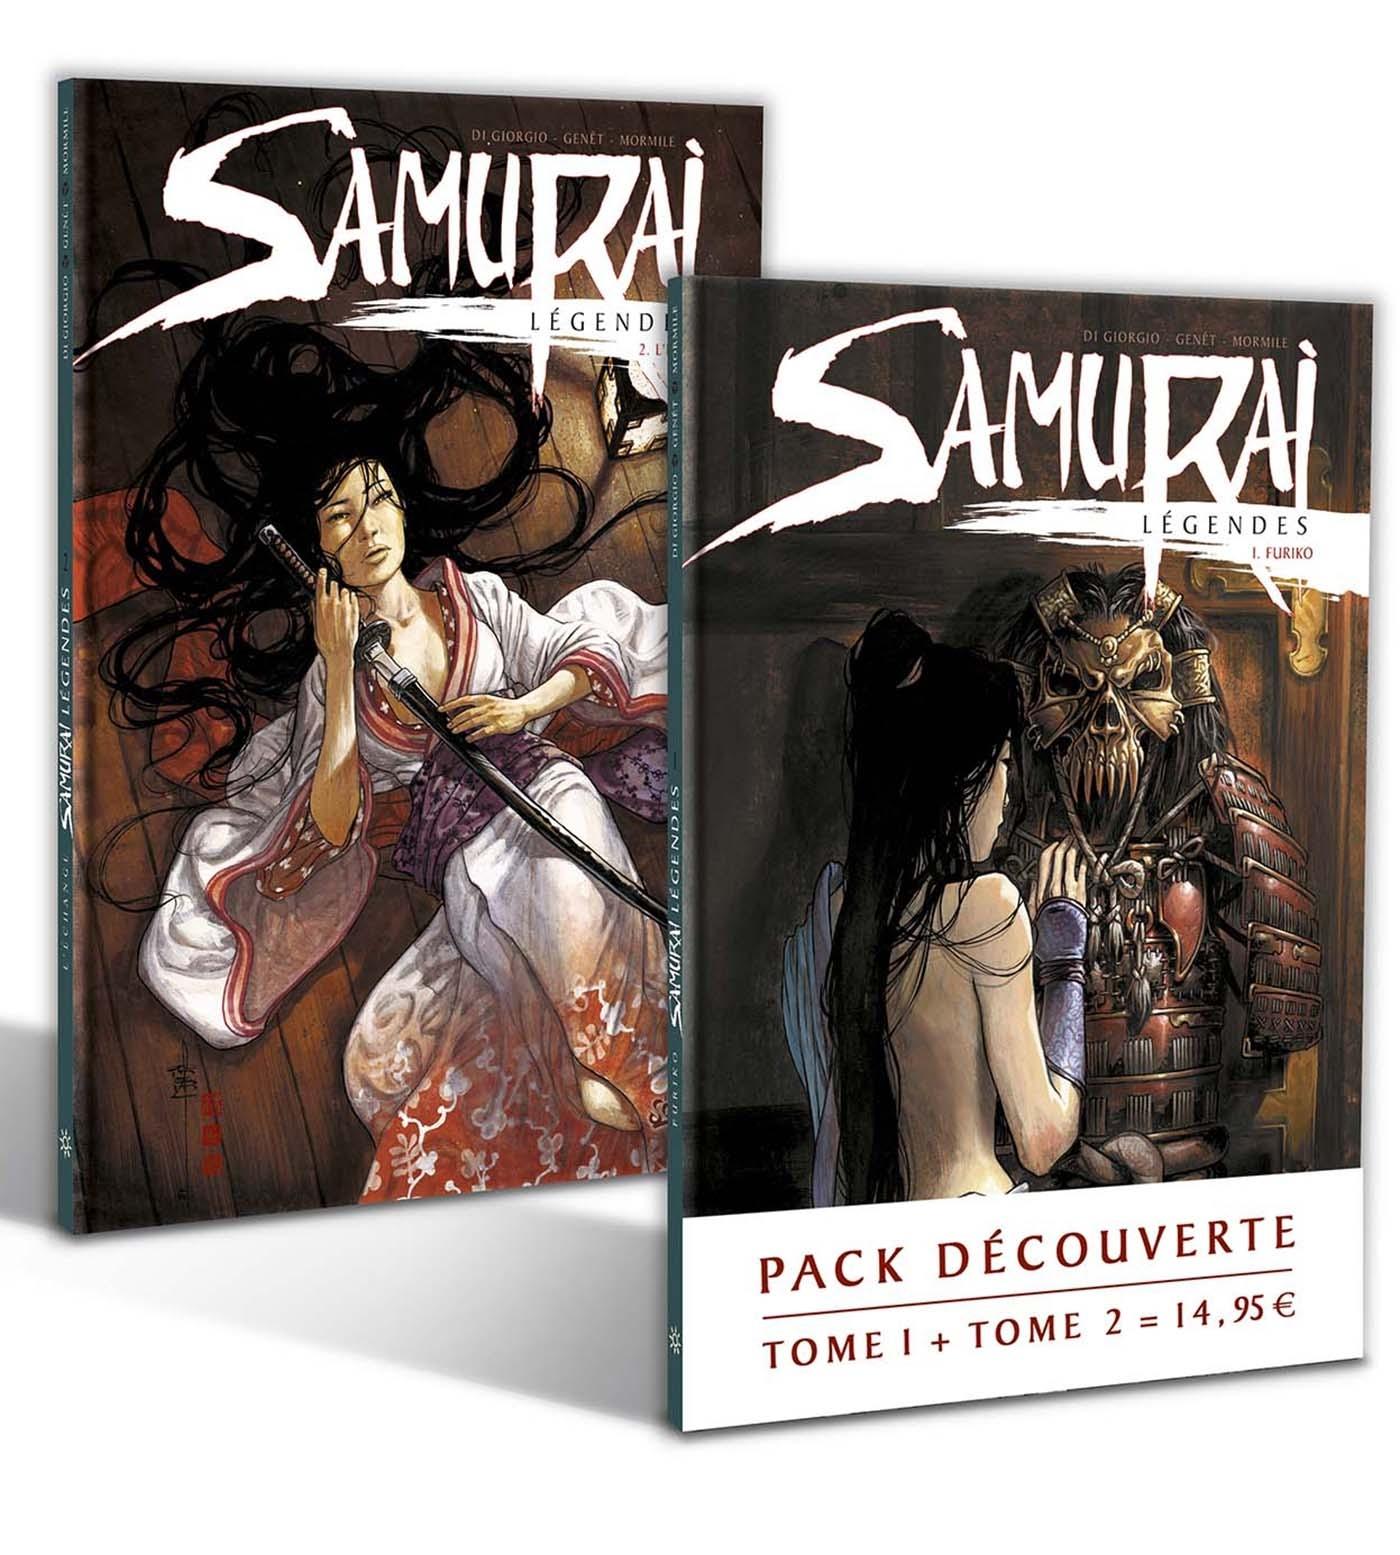 SAMURAI LEGENDES - PACK T1+T2 HC